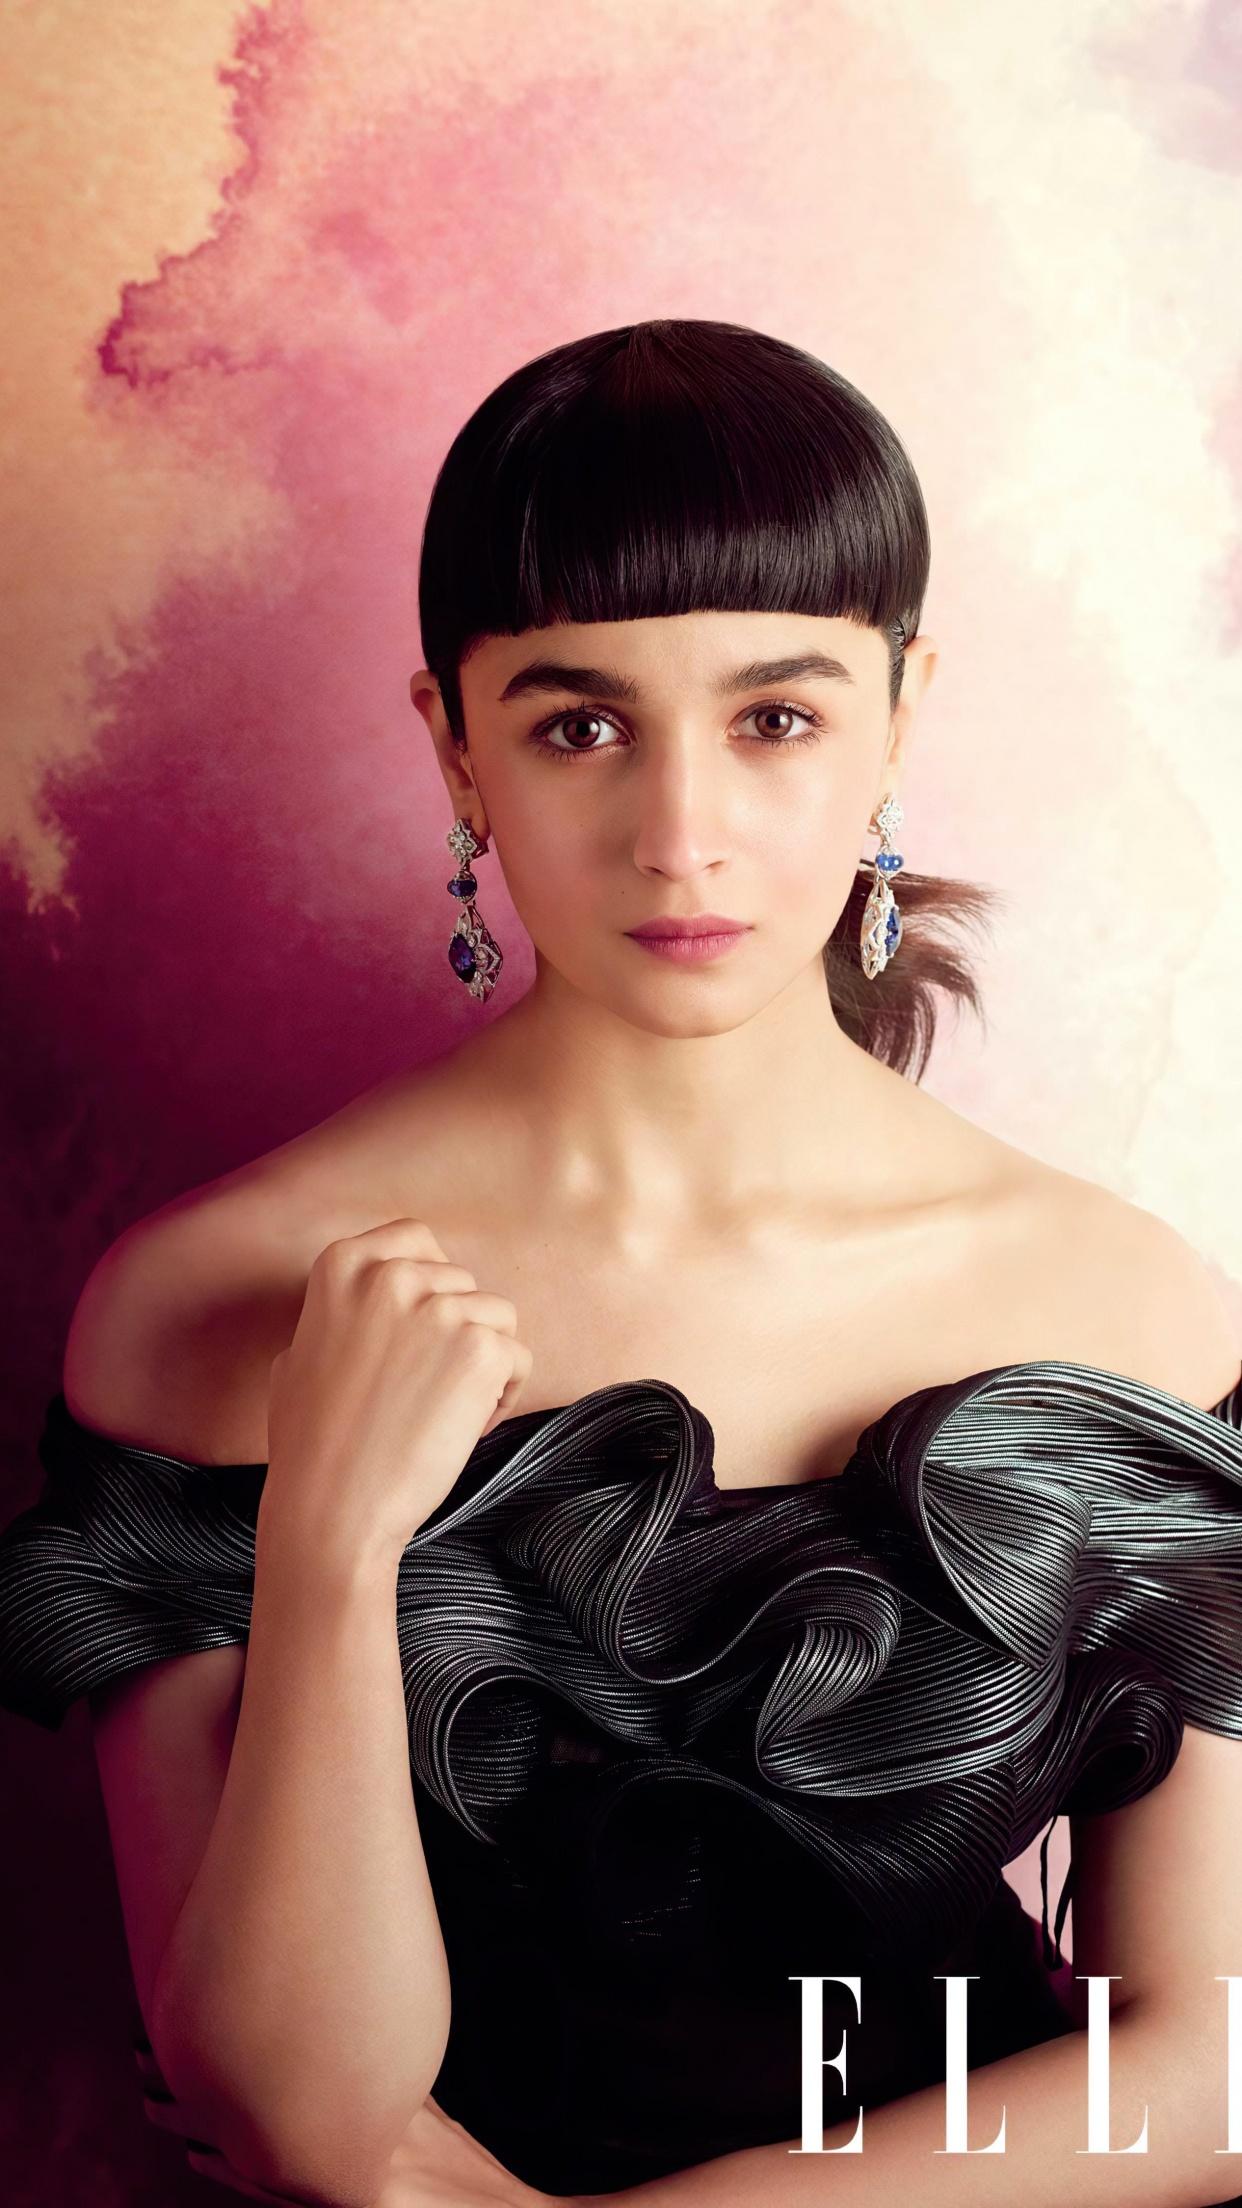 Alia Bhatt Wallpaper 4K, Bollywood actress, Portrait